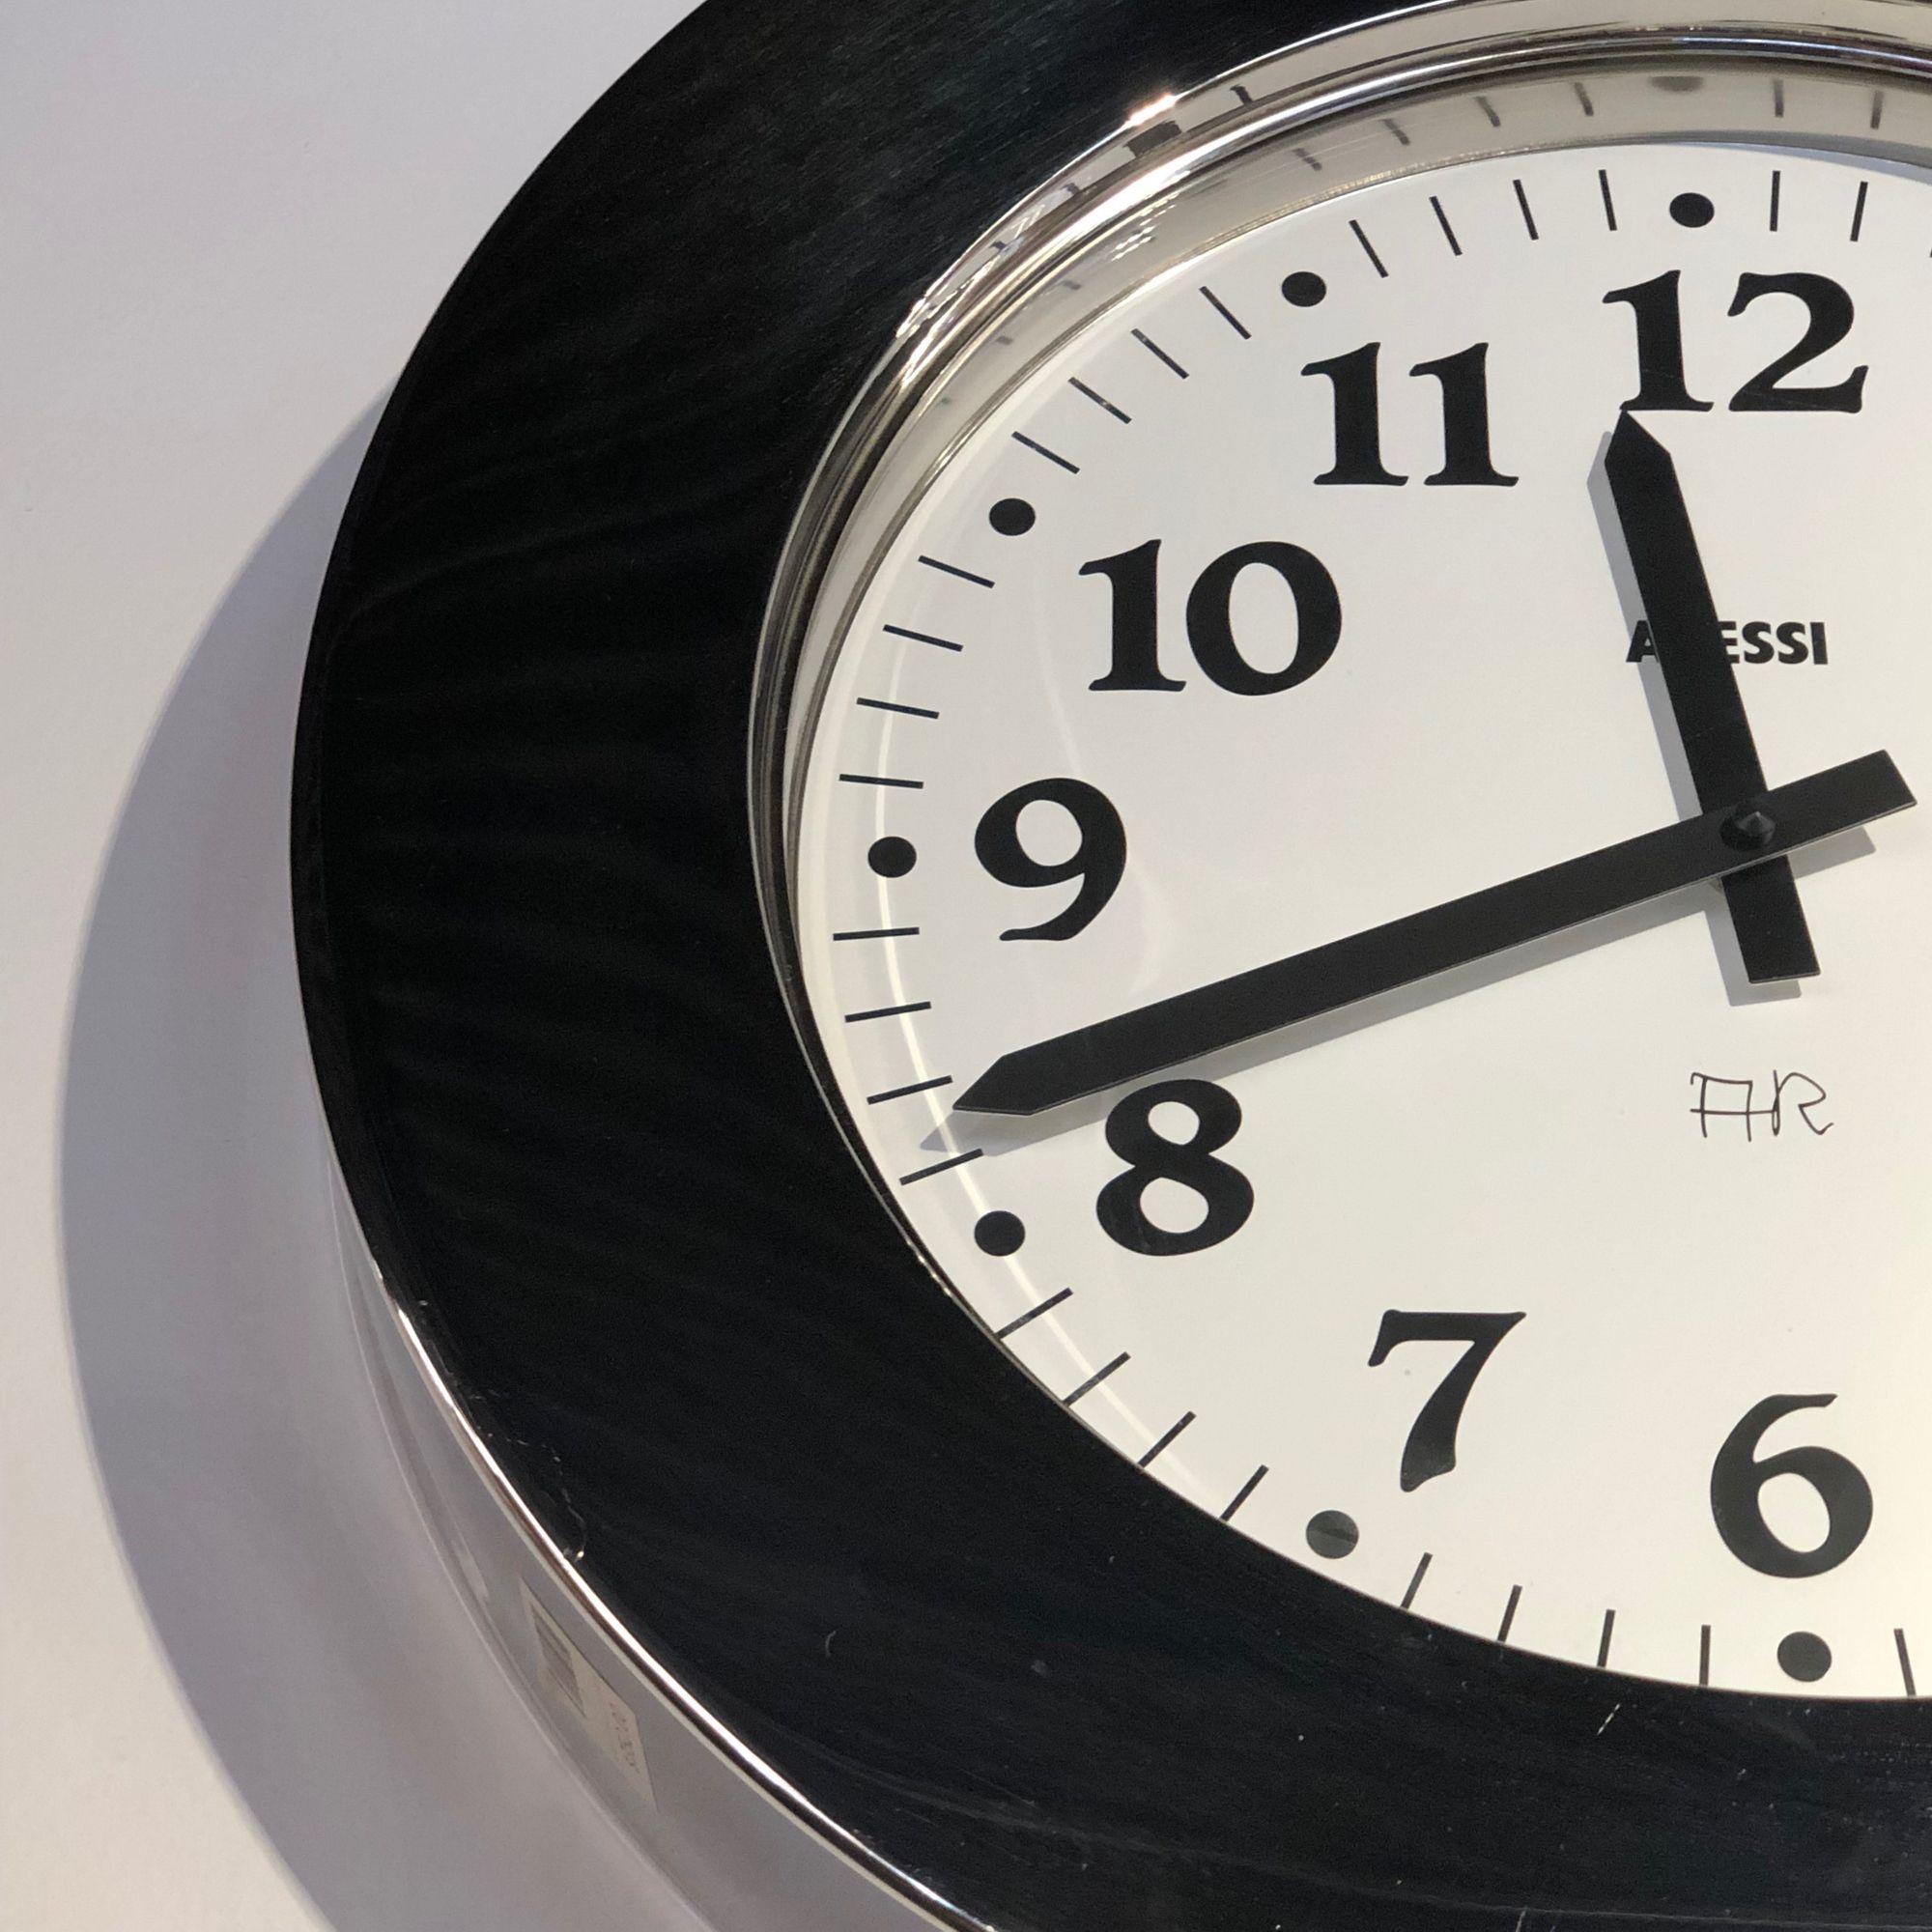 Alessi Momento Wall Clock 11 Wall Clock Clock Alessi